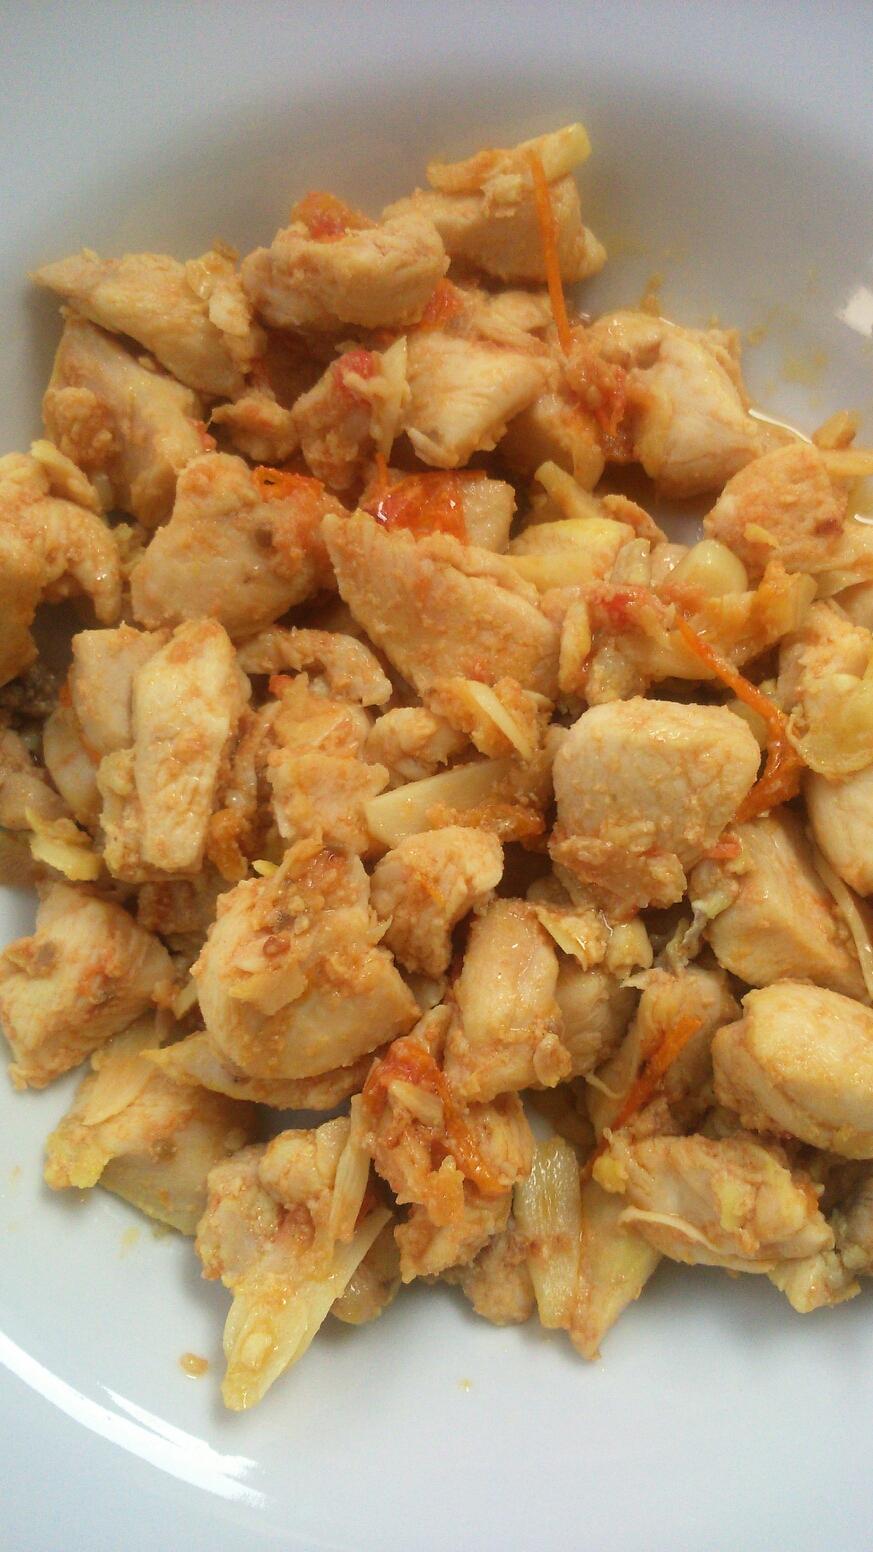 Resep Mpasi Ayam Tumis Mentega Zarahgy S Blog